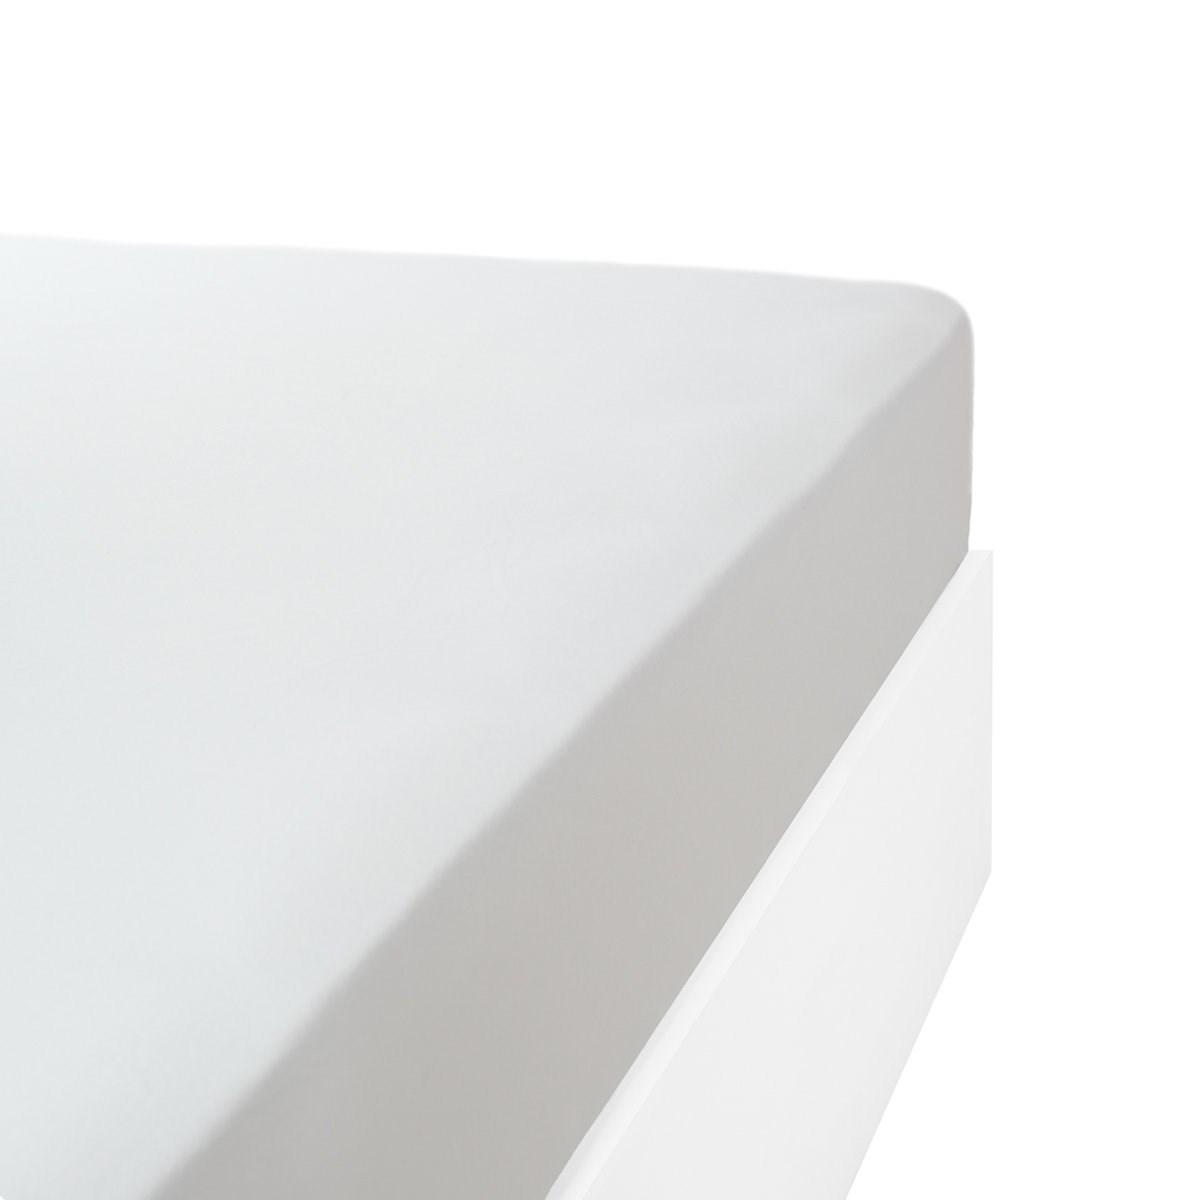 Drap housse jersey extensible en coton blanc 130x190 cm